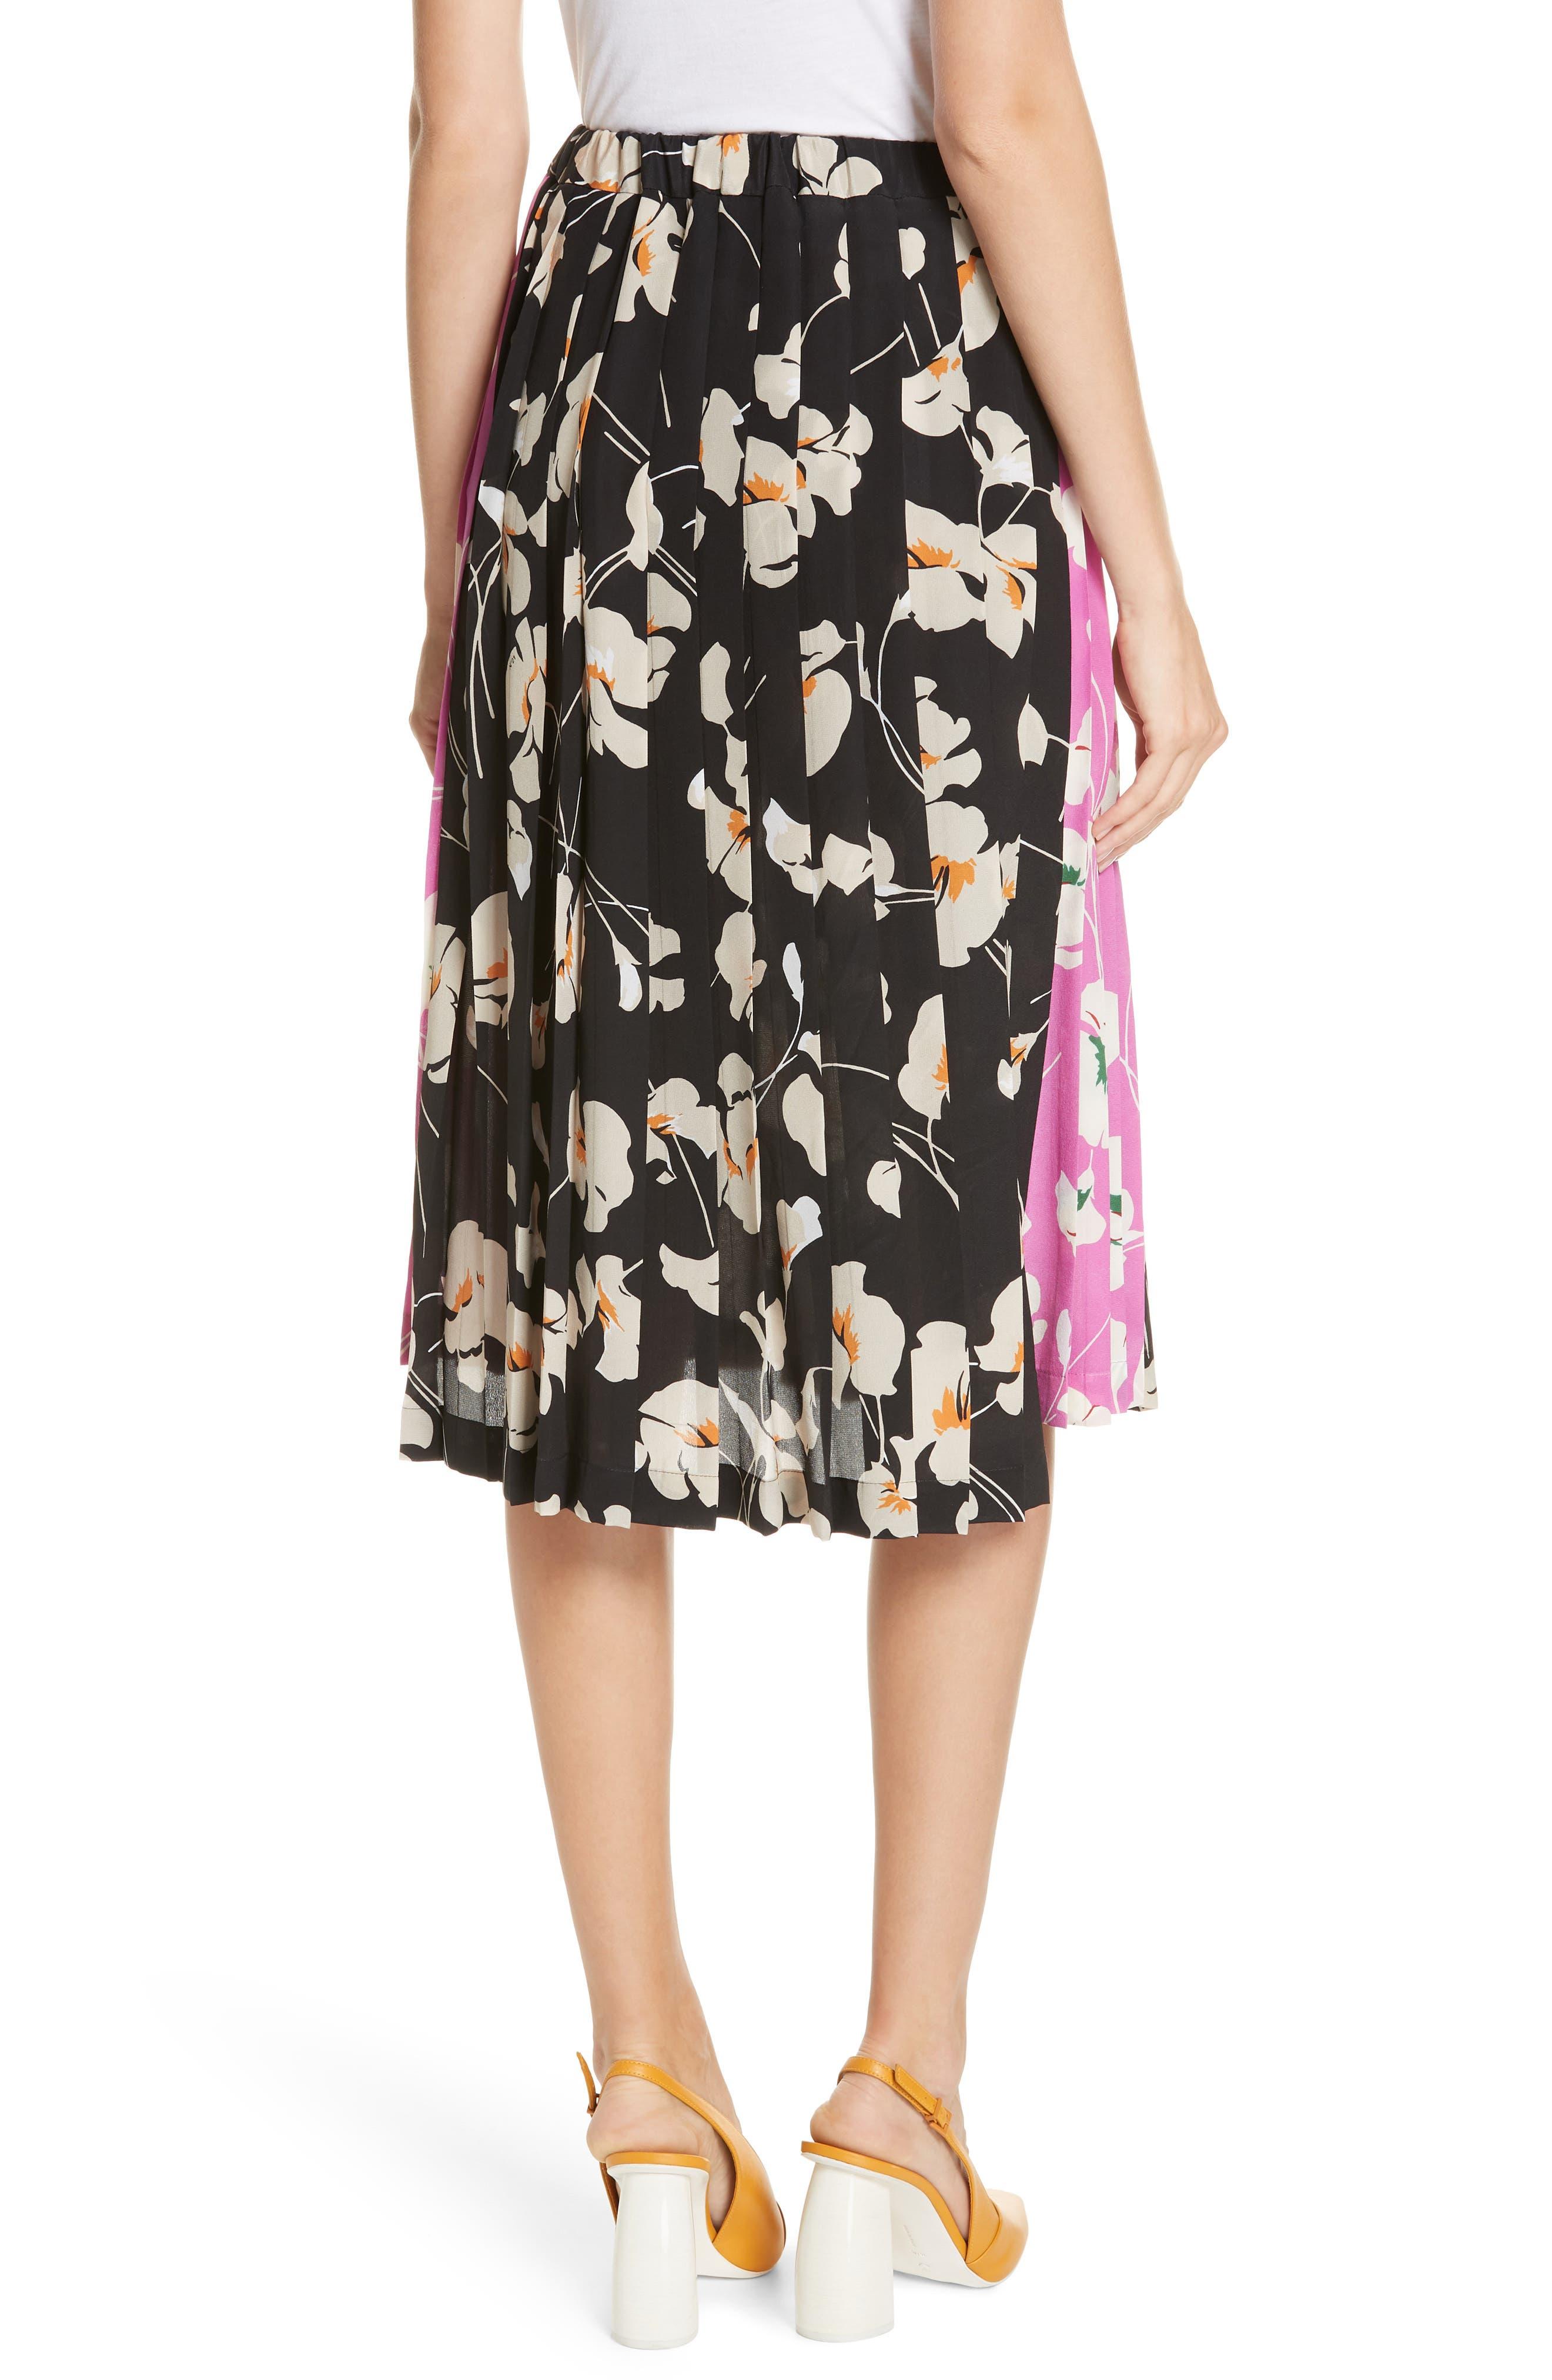 N°21,                             Nº21 Contrast Panel Floral Print Silk Skirt,                             Alternate thumbnail 2, color,                             STAMPA FONDO NERO